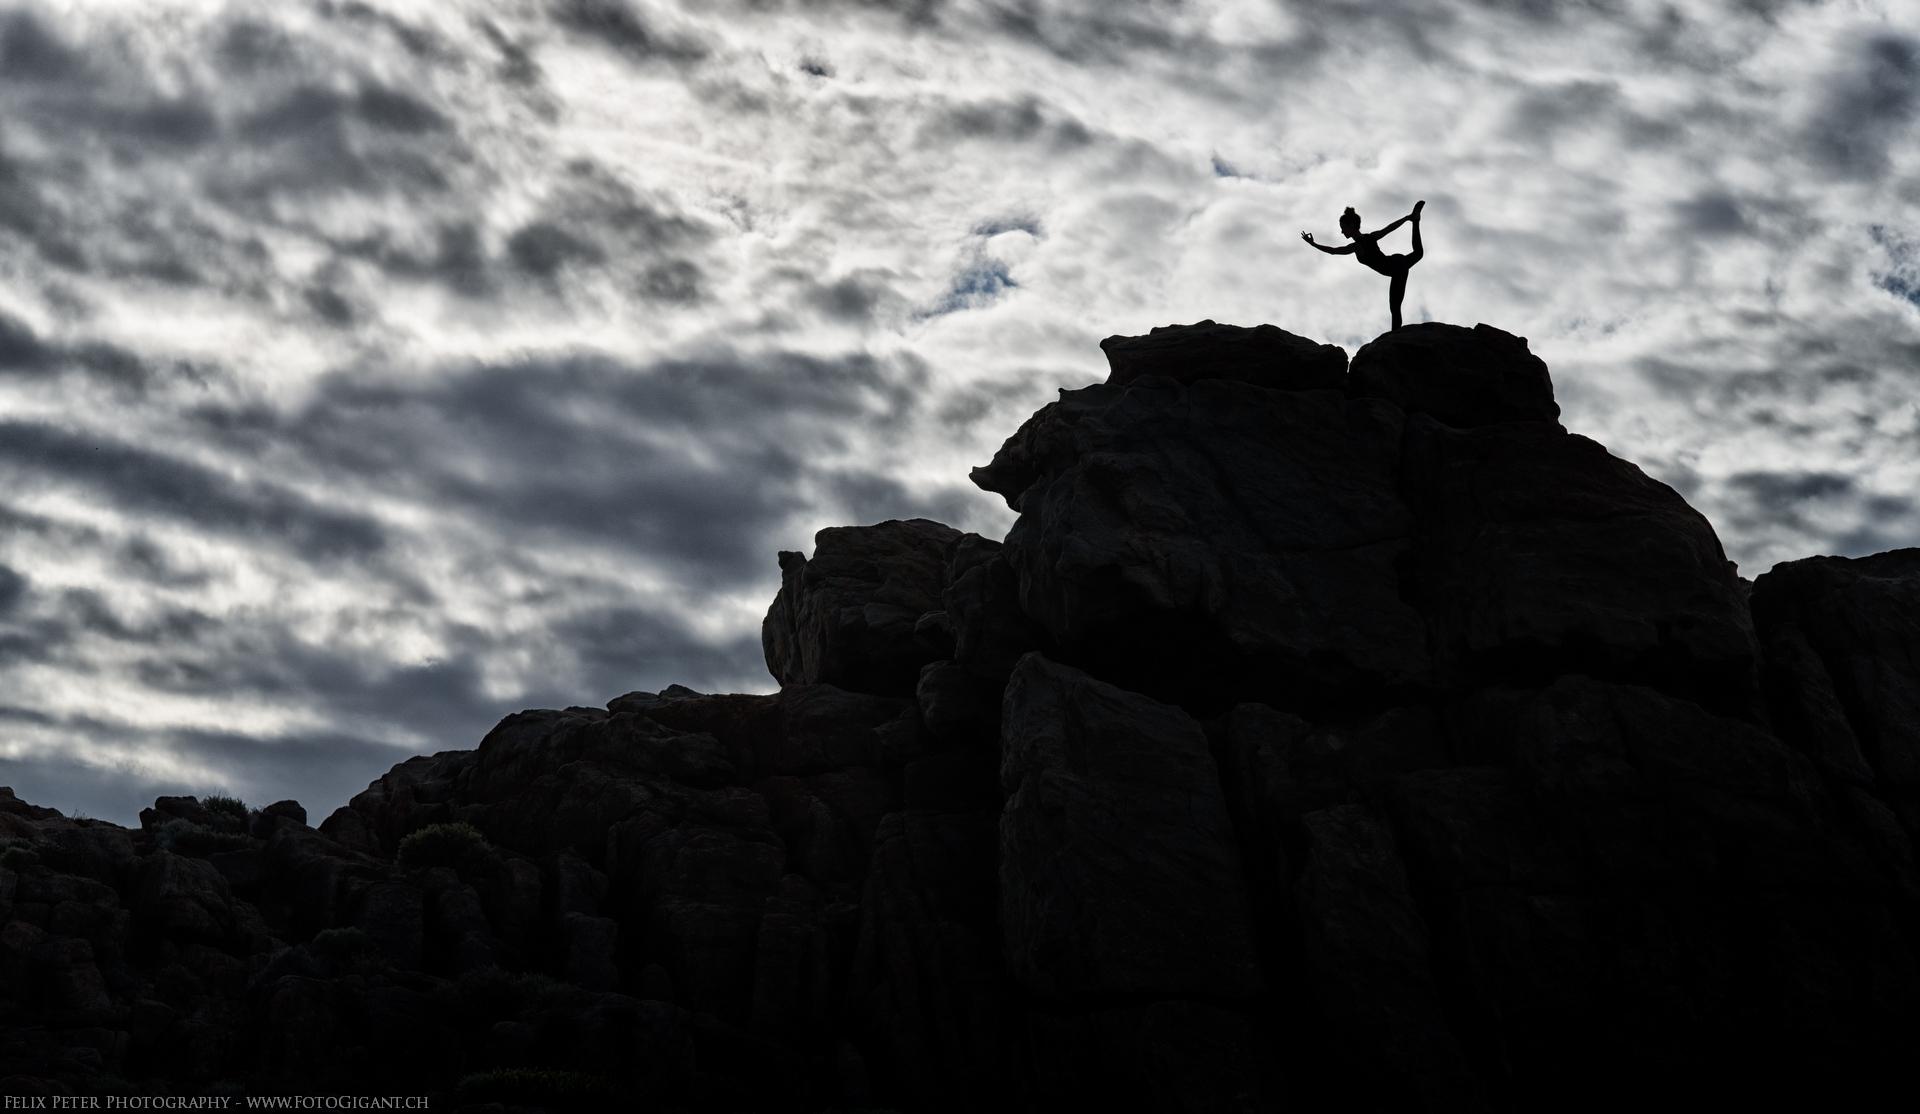 Felix-Peter-Yoga-Pilates-Dance-Fotografie_Bern_054.jpg